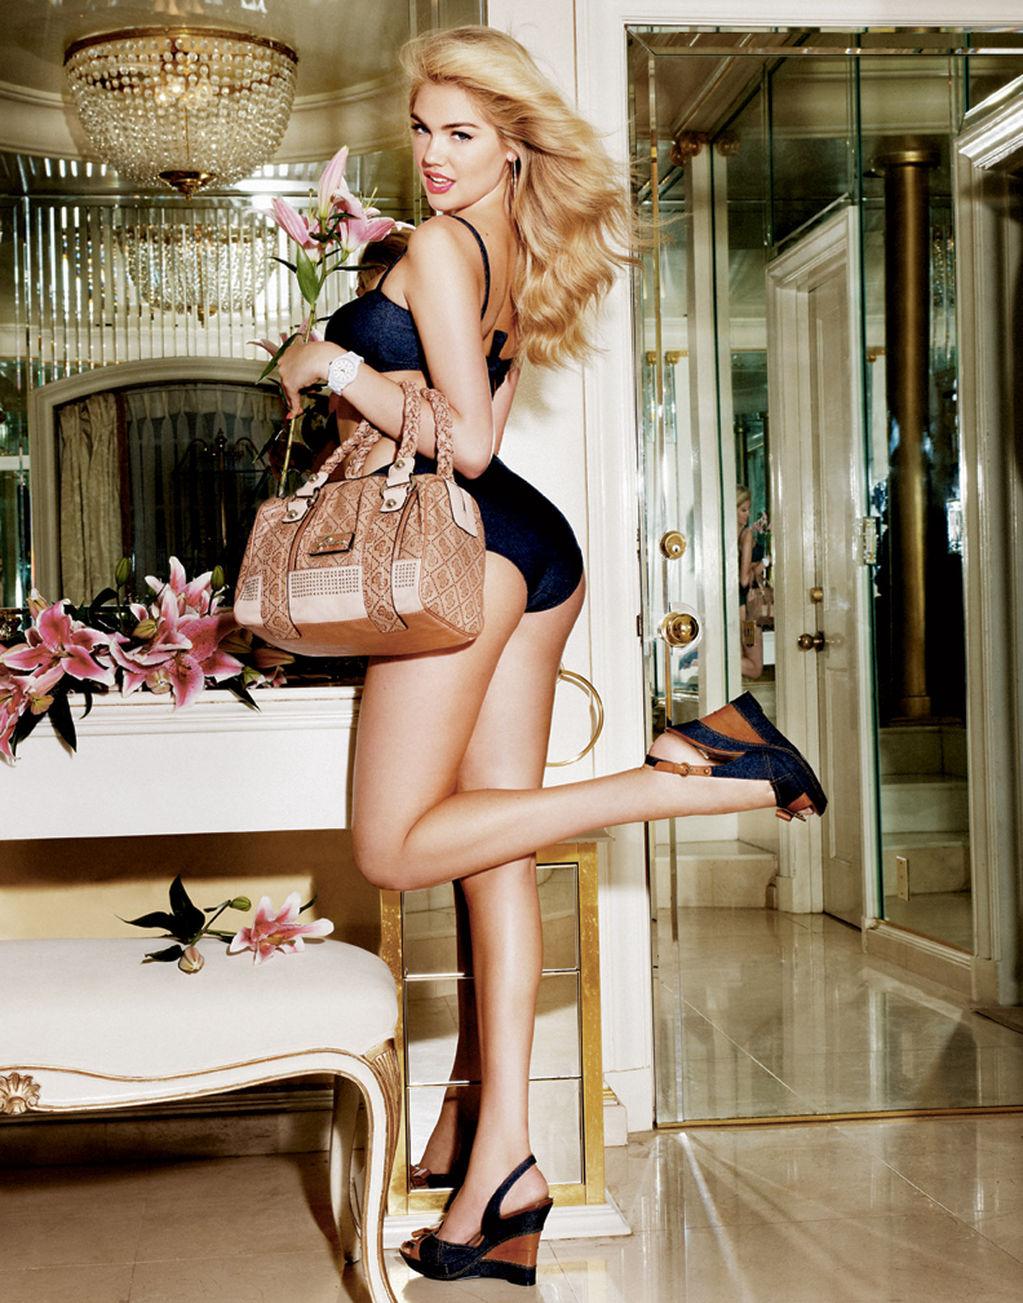 Celebritybuzzus Fashion Model Kate Upton Guess Photo -1310